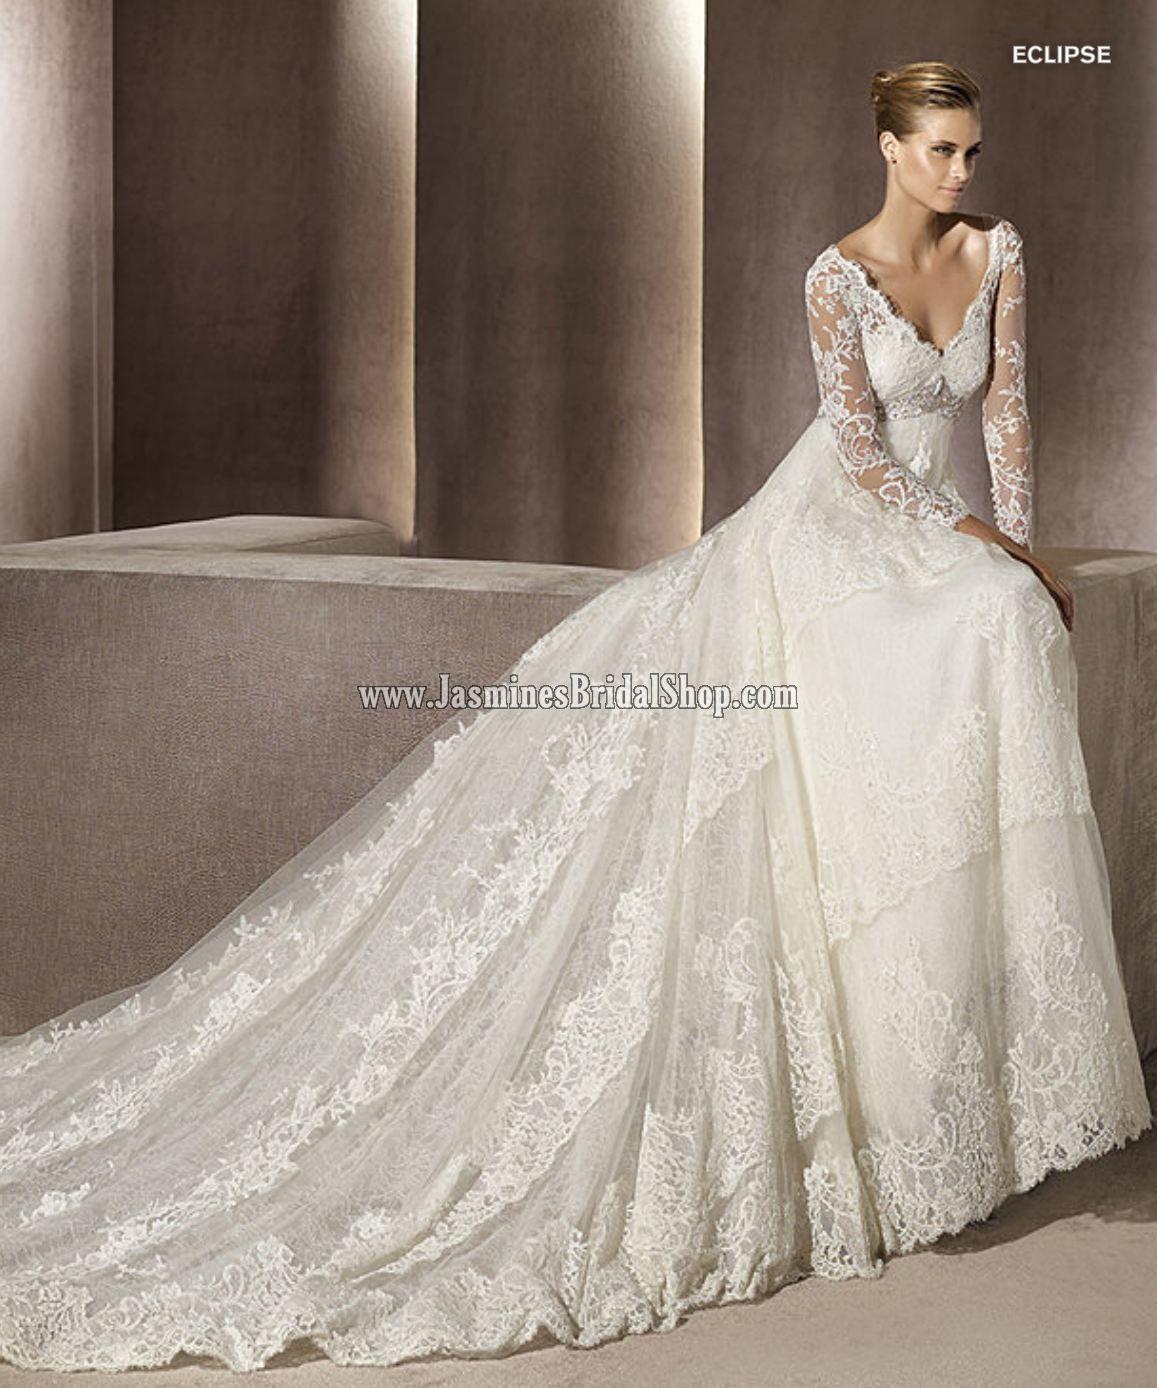 Love love love lovvvve neckline lace length shape sleeves want